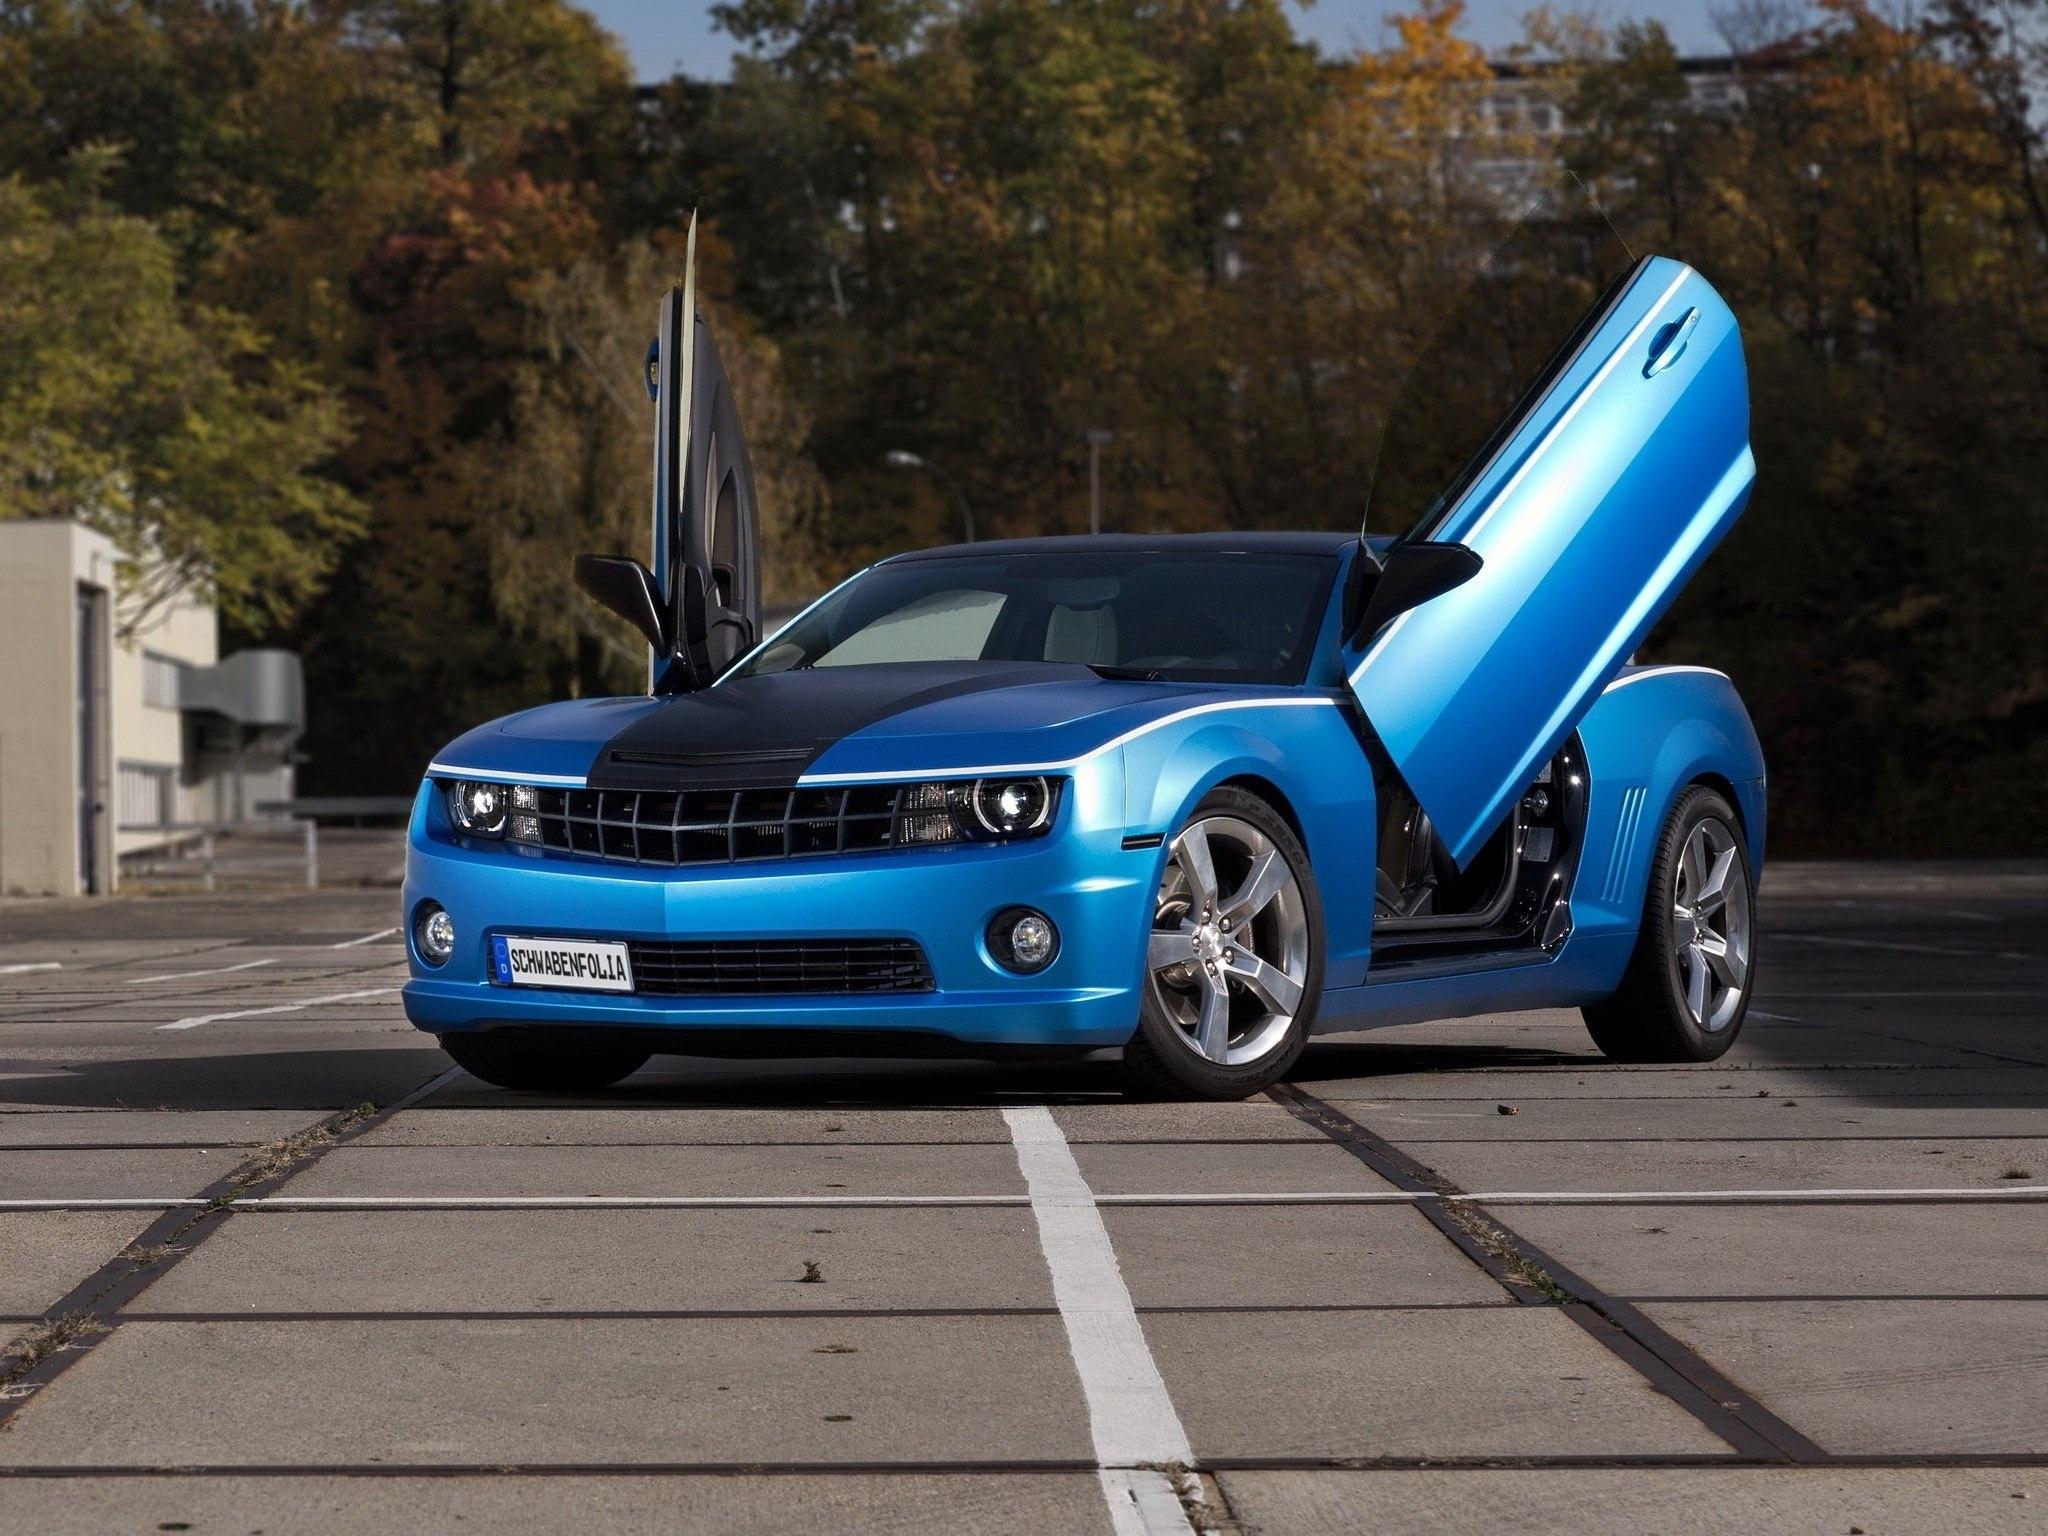 55878 download wallpaper Cars, Chevrolet Camaro, Auto, Car, Machine, Doors, Door screensavers and pictures for free